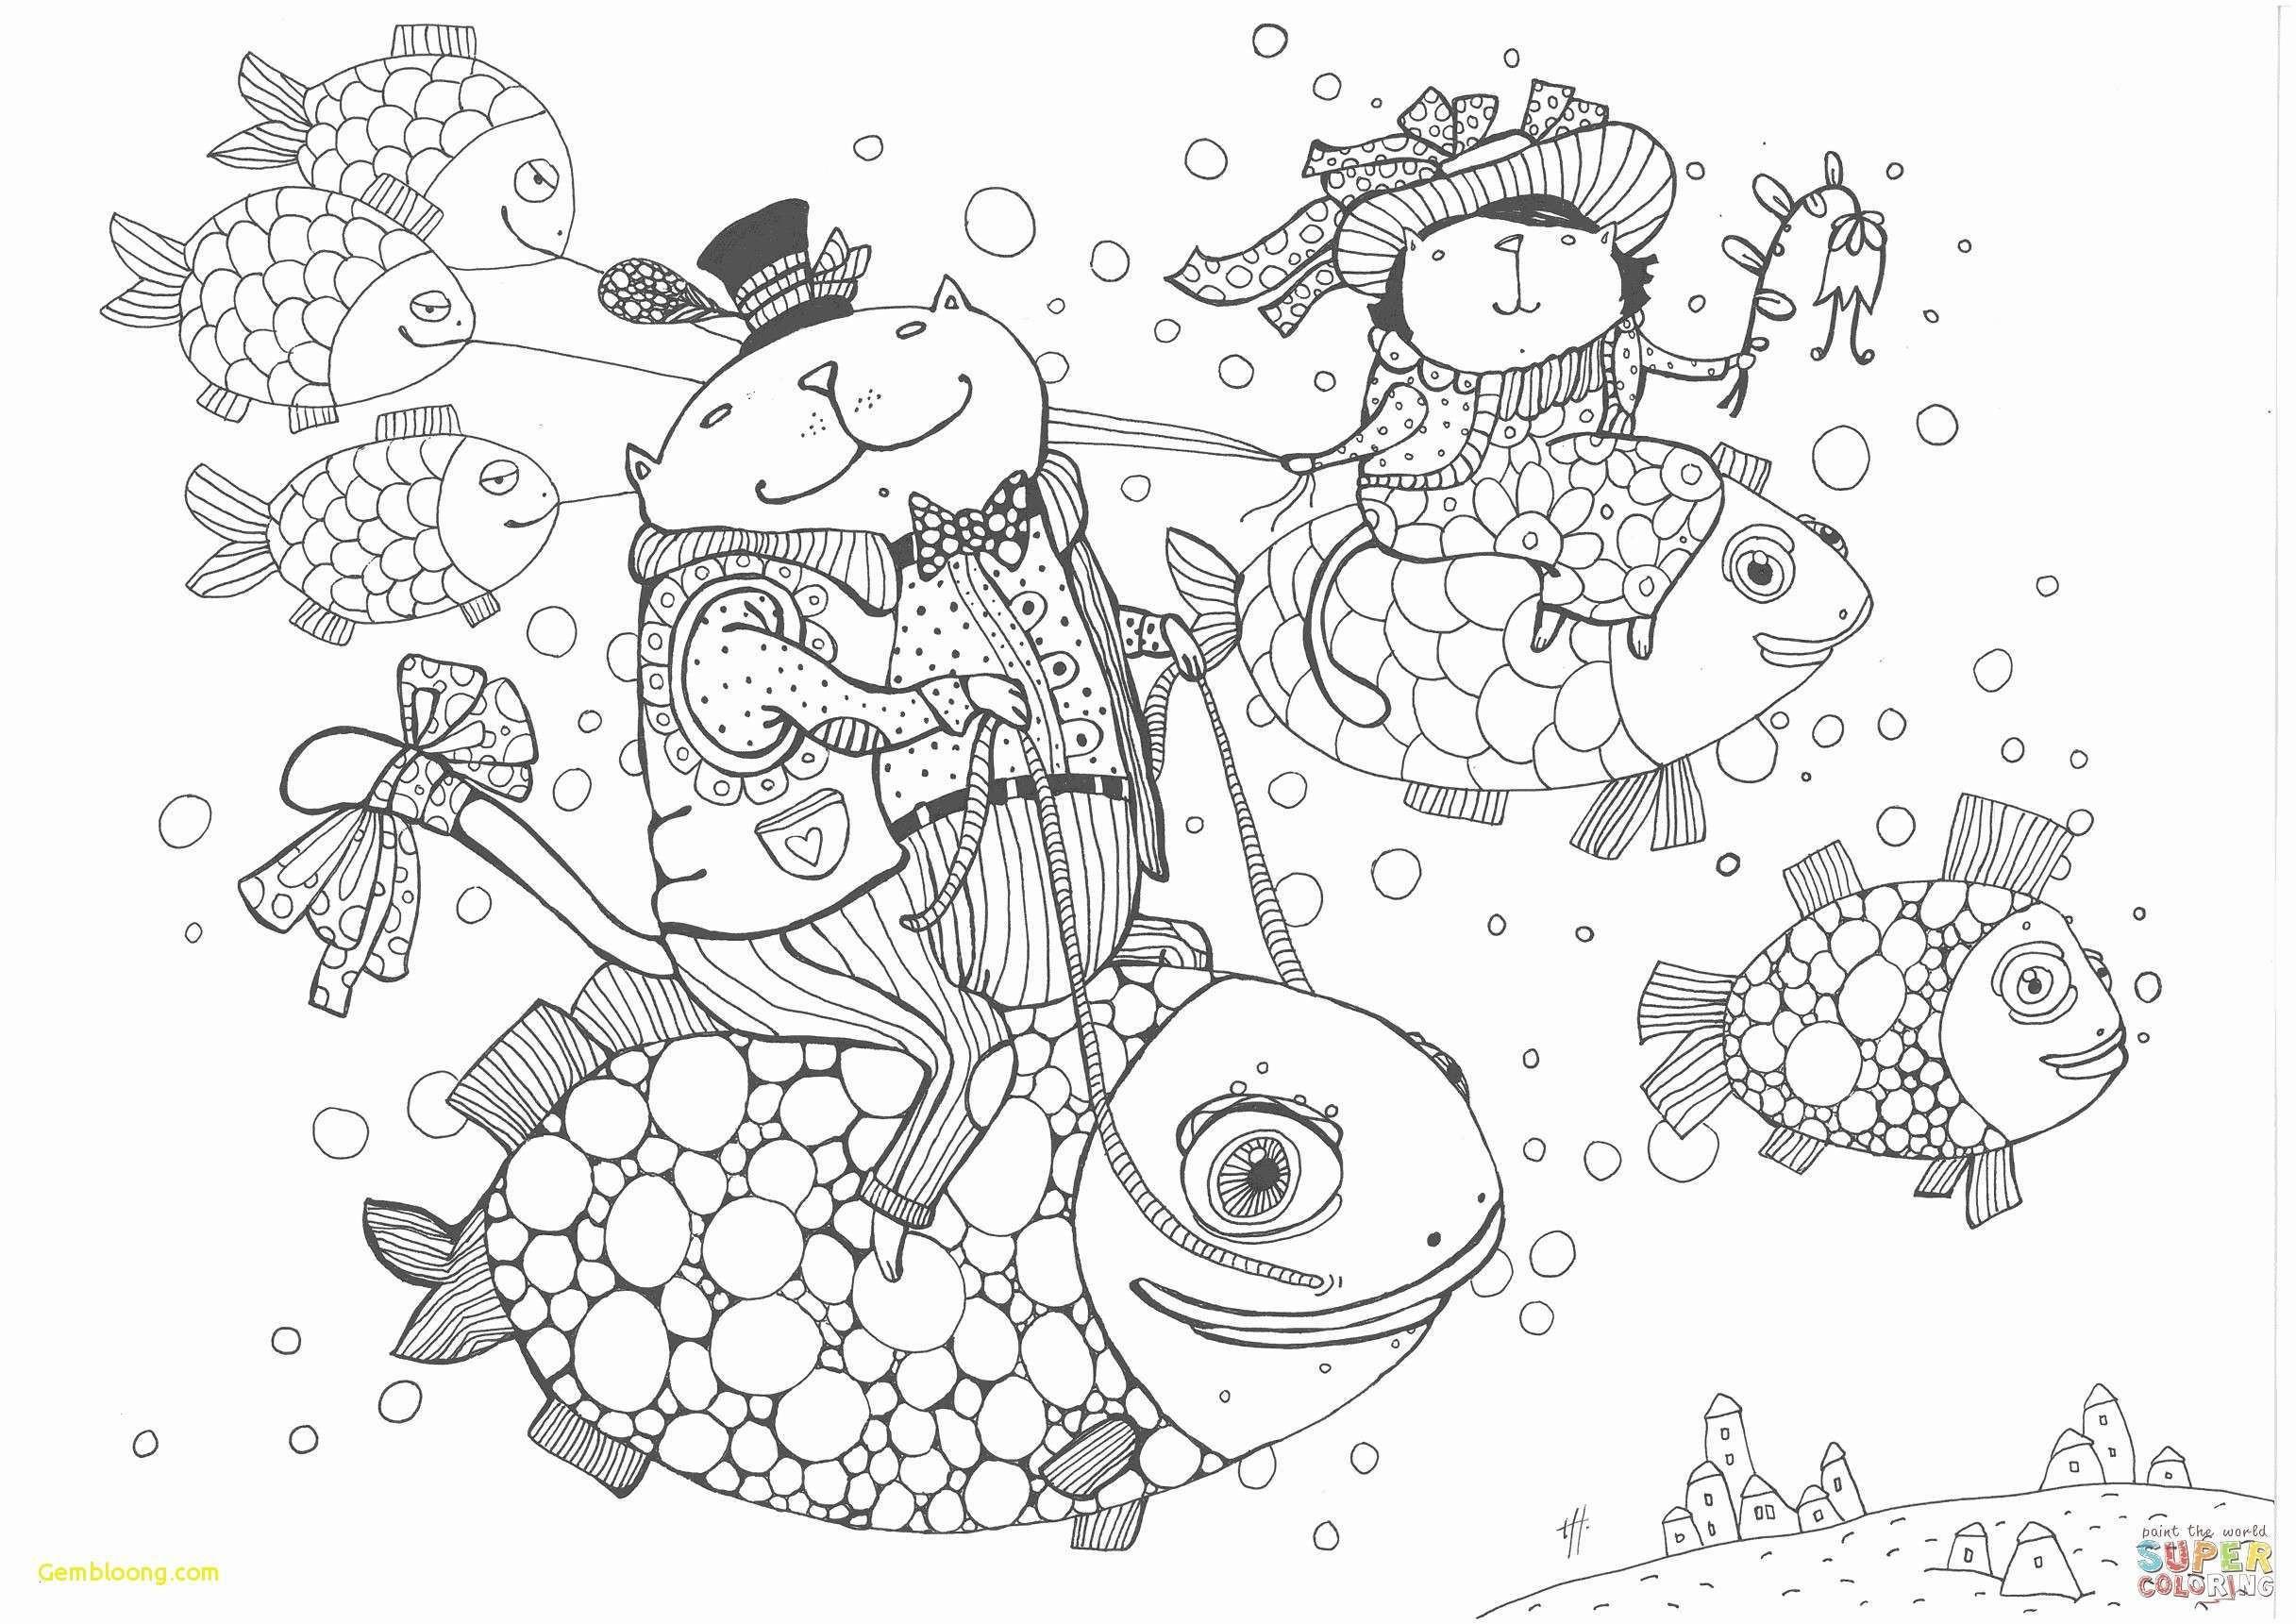 Elsa Im Schloss Ausmalbilder Genial Elsa Christmas Coloring Pages Printable Malvorlagen Schön Stock